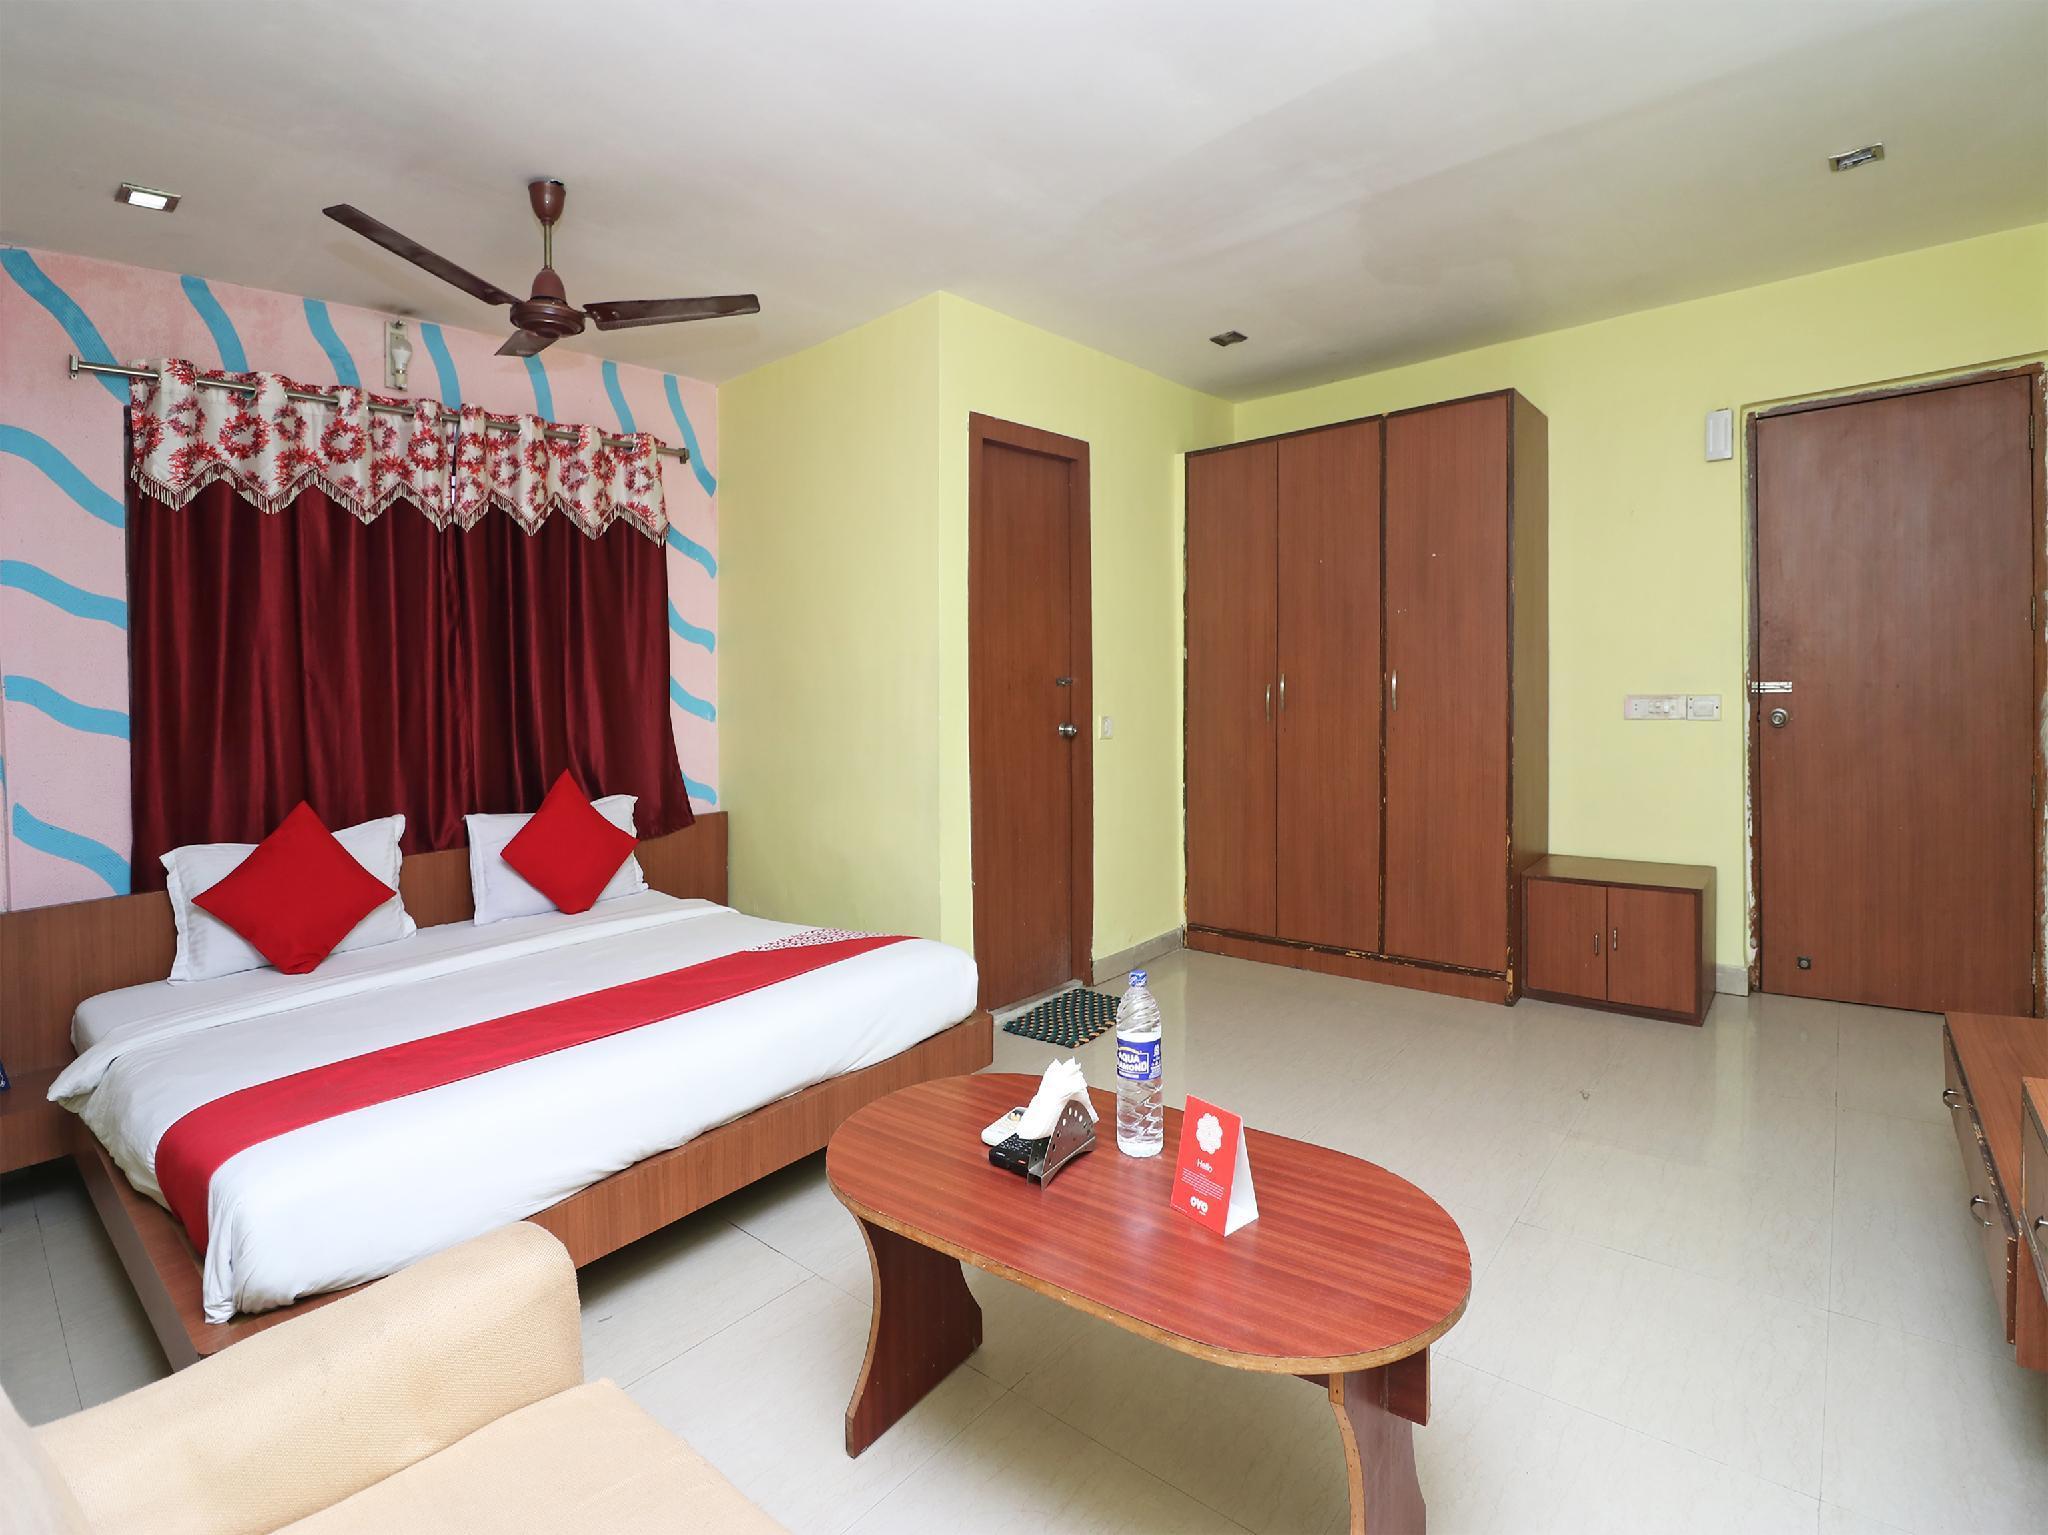 OYO 1764 Hotel Maruti Lodging